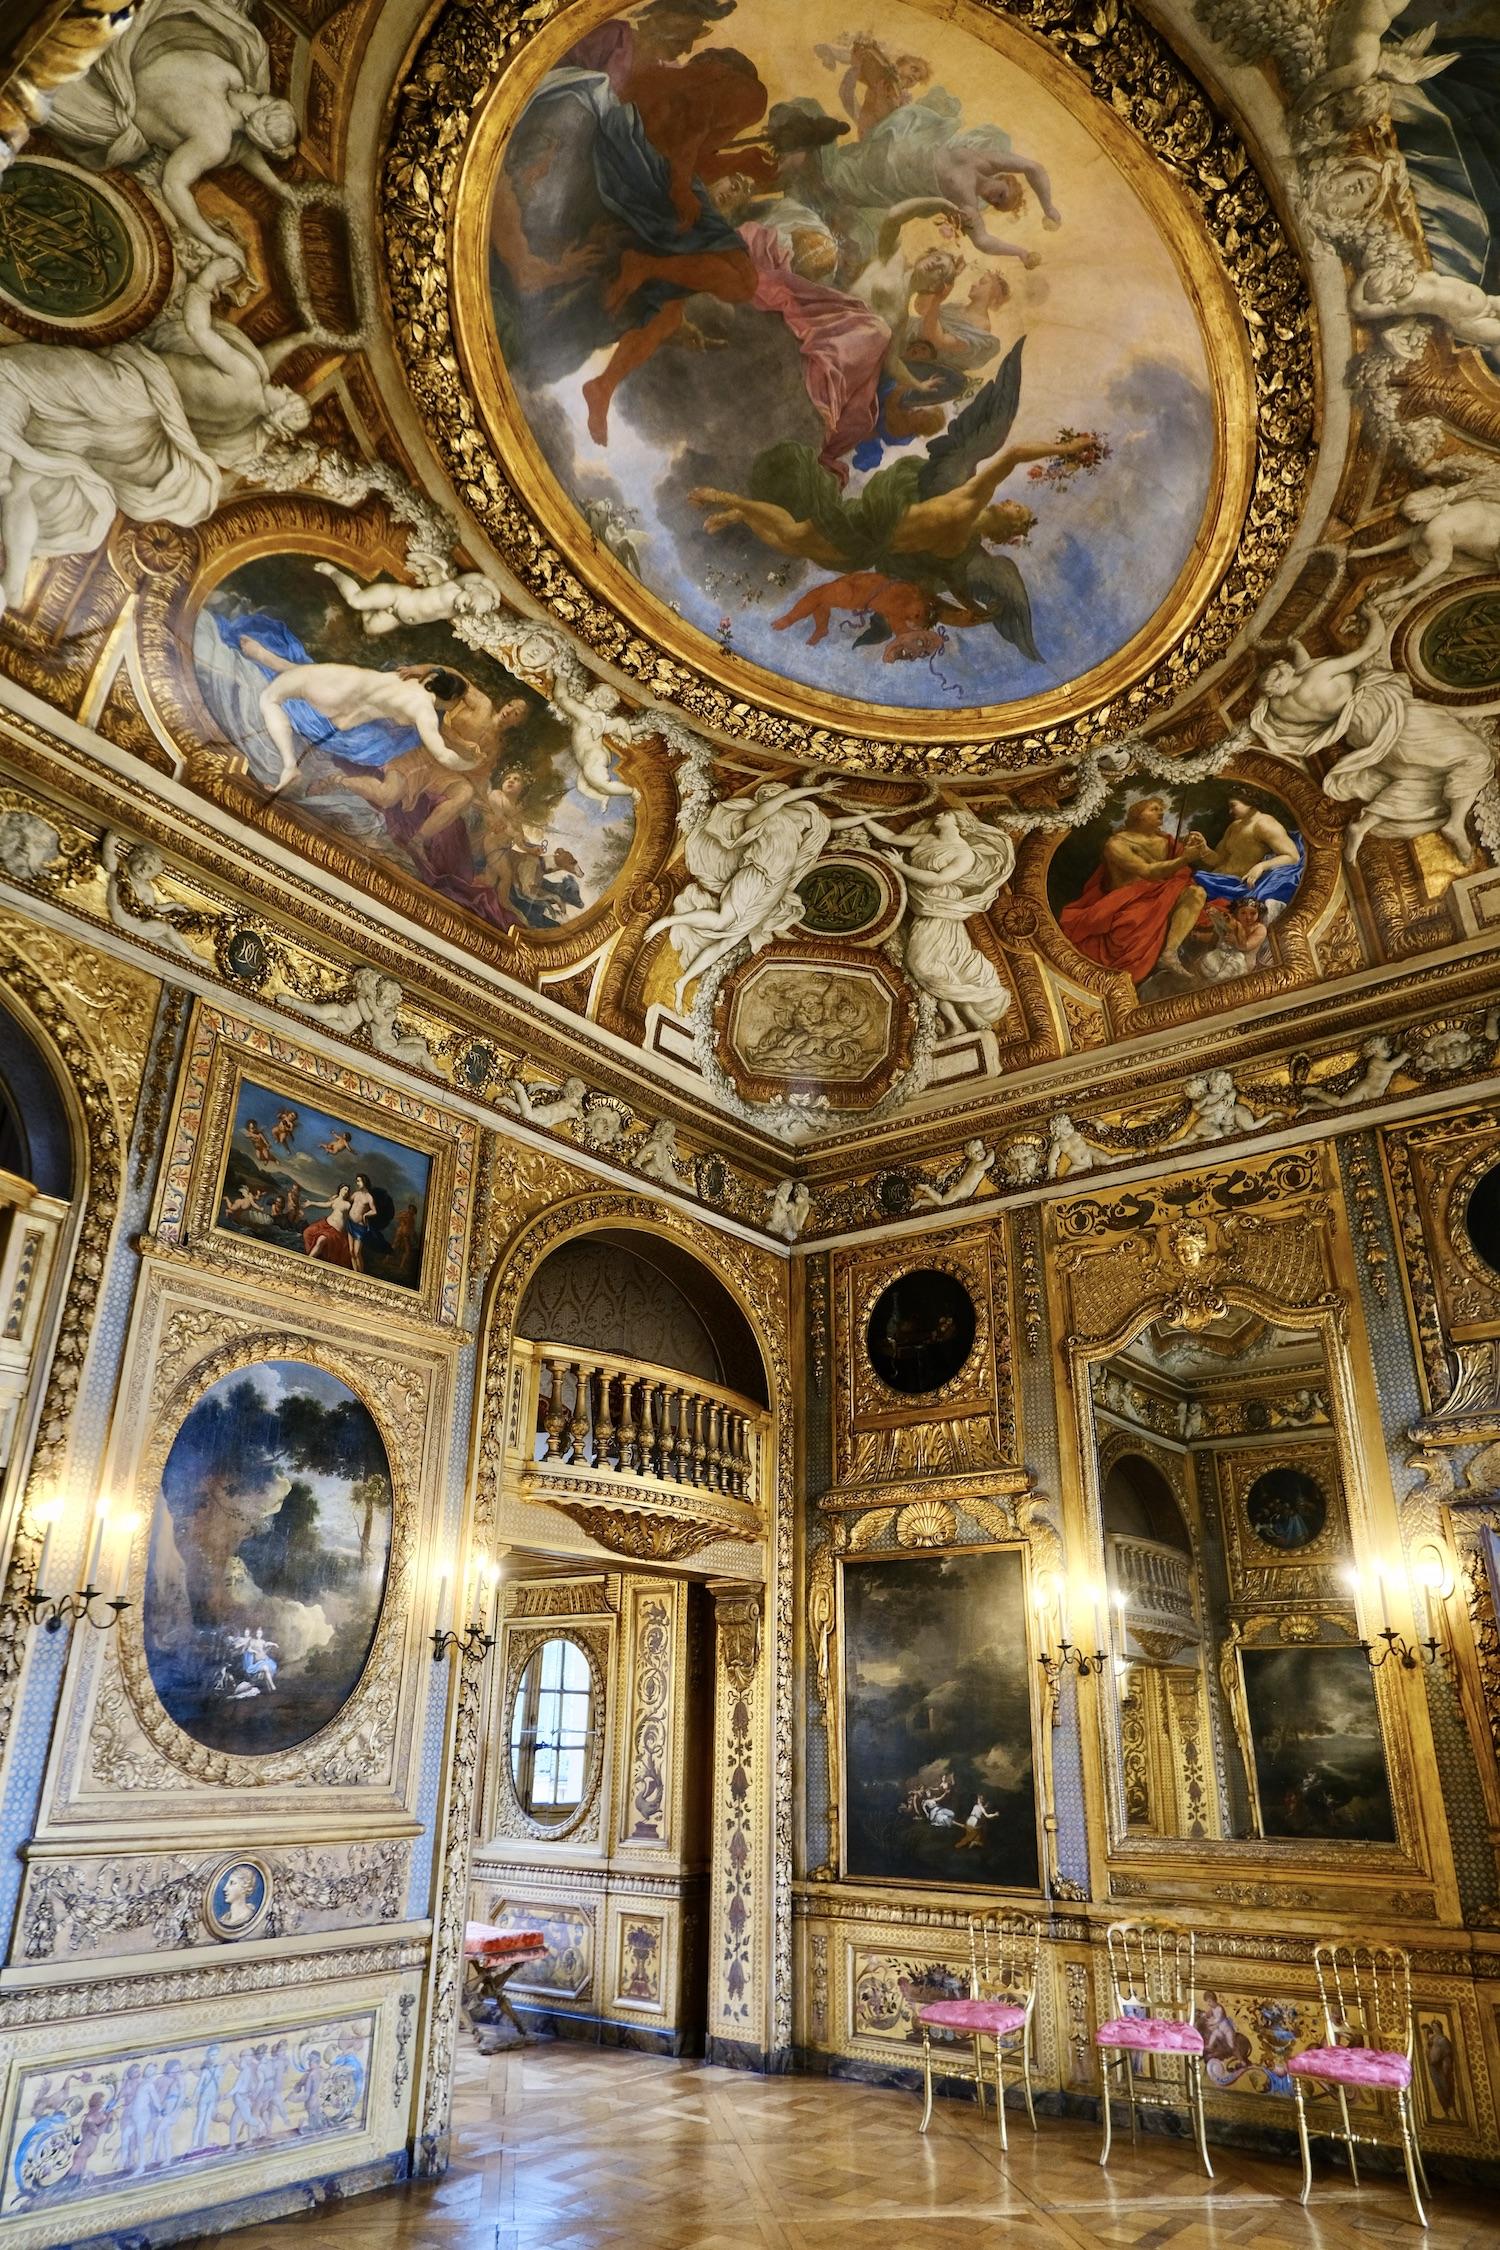 Hôtel de Lauzun Music Room Five Friday Finds from France